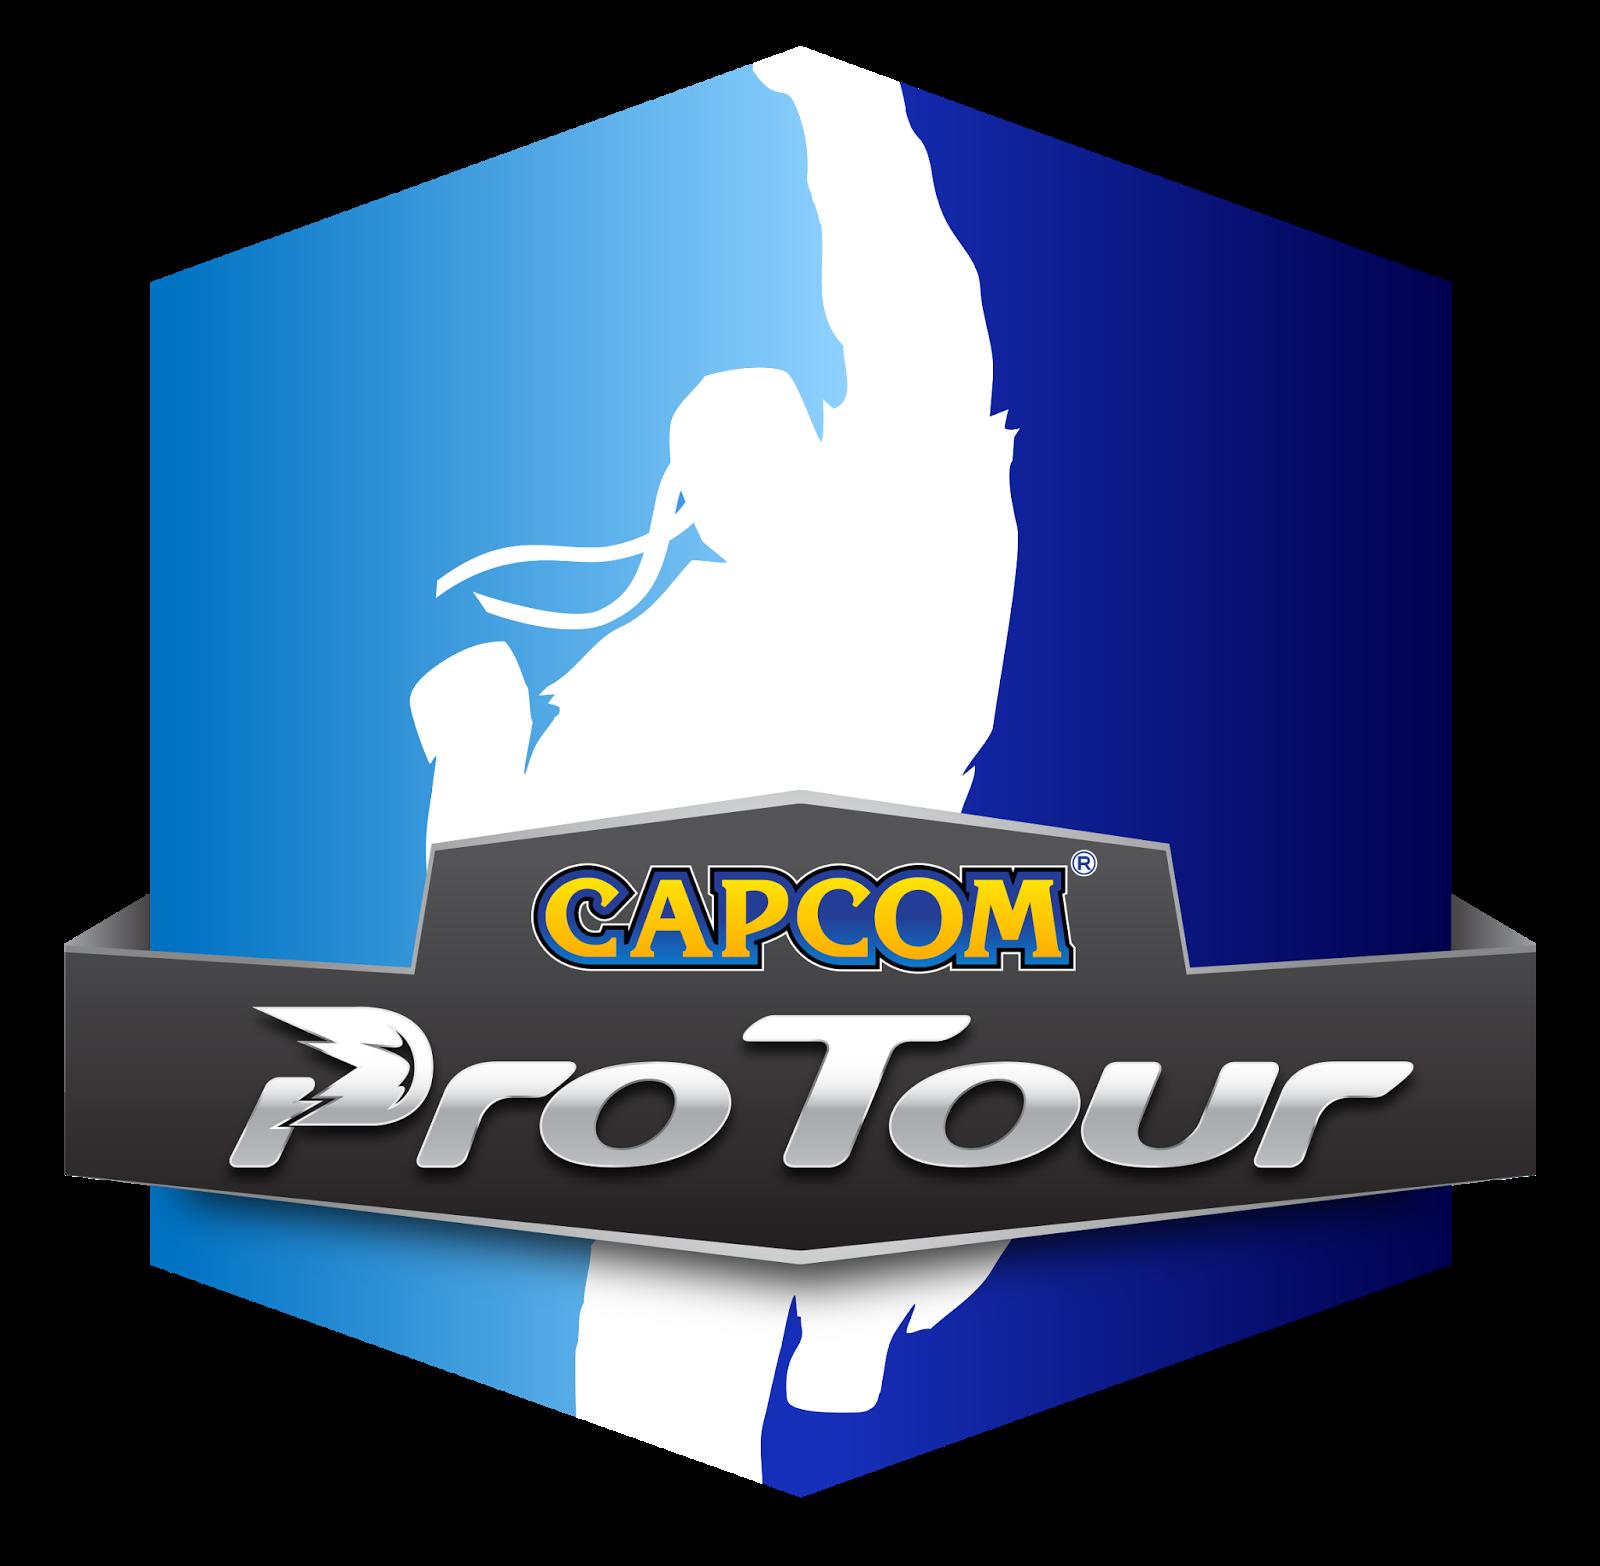 Capcom Pro Tour - Изображение 1